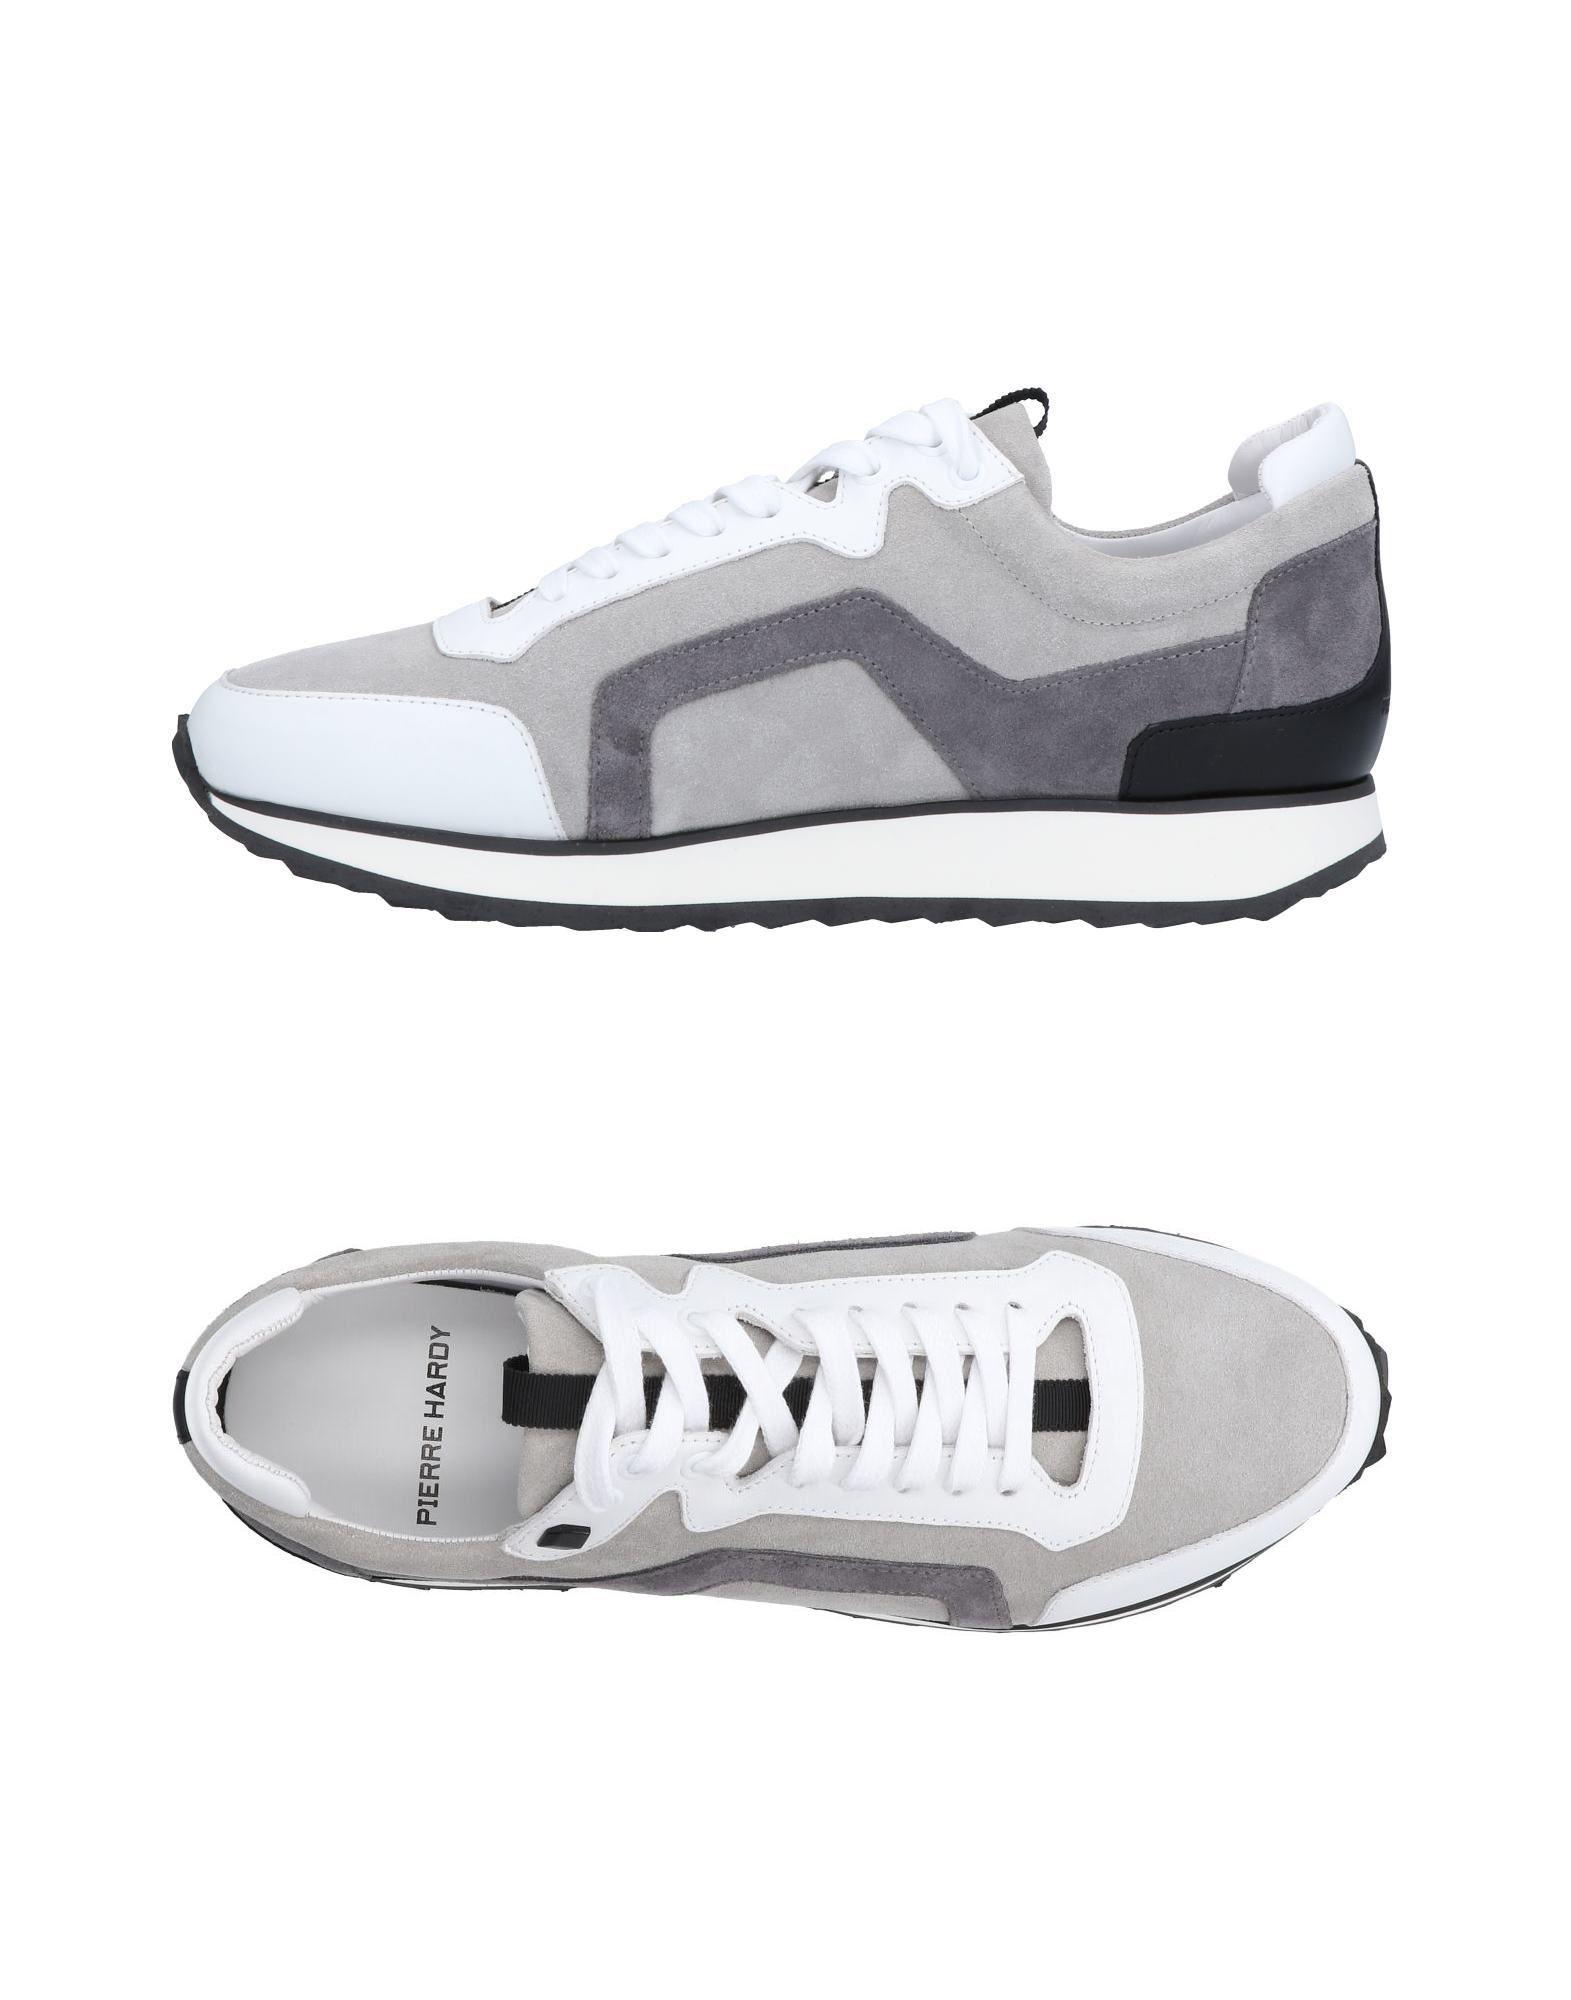 Pierre Hardy Sneakers Herren  11496406XH Gute Qualität beliebte Schuhe